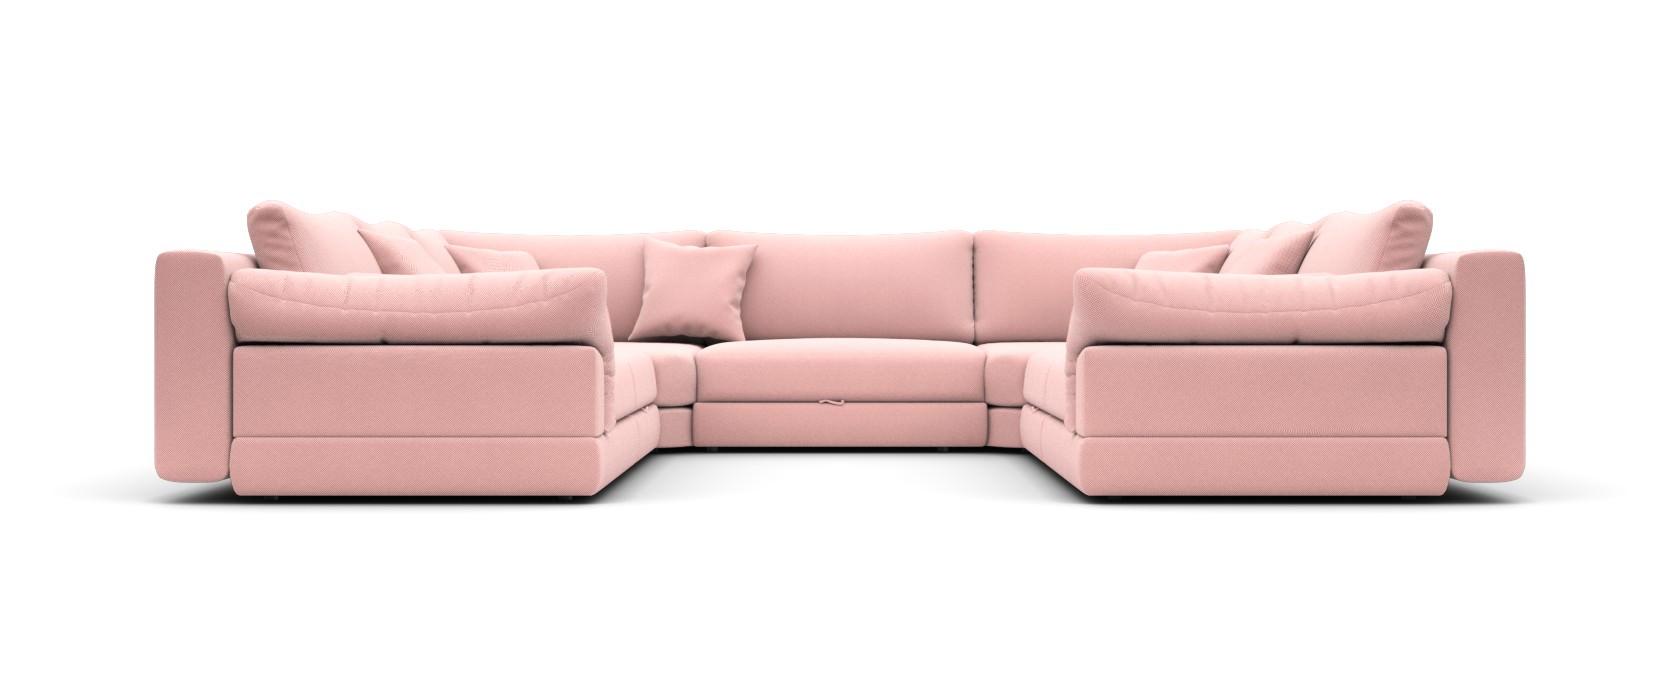 Модульний диван Claudia 340x355 - Pufetto